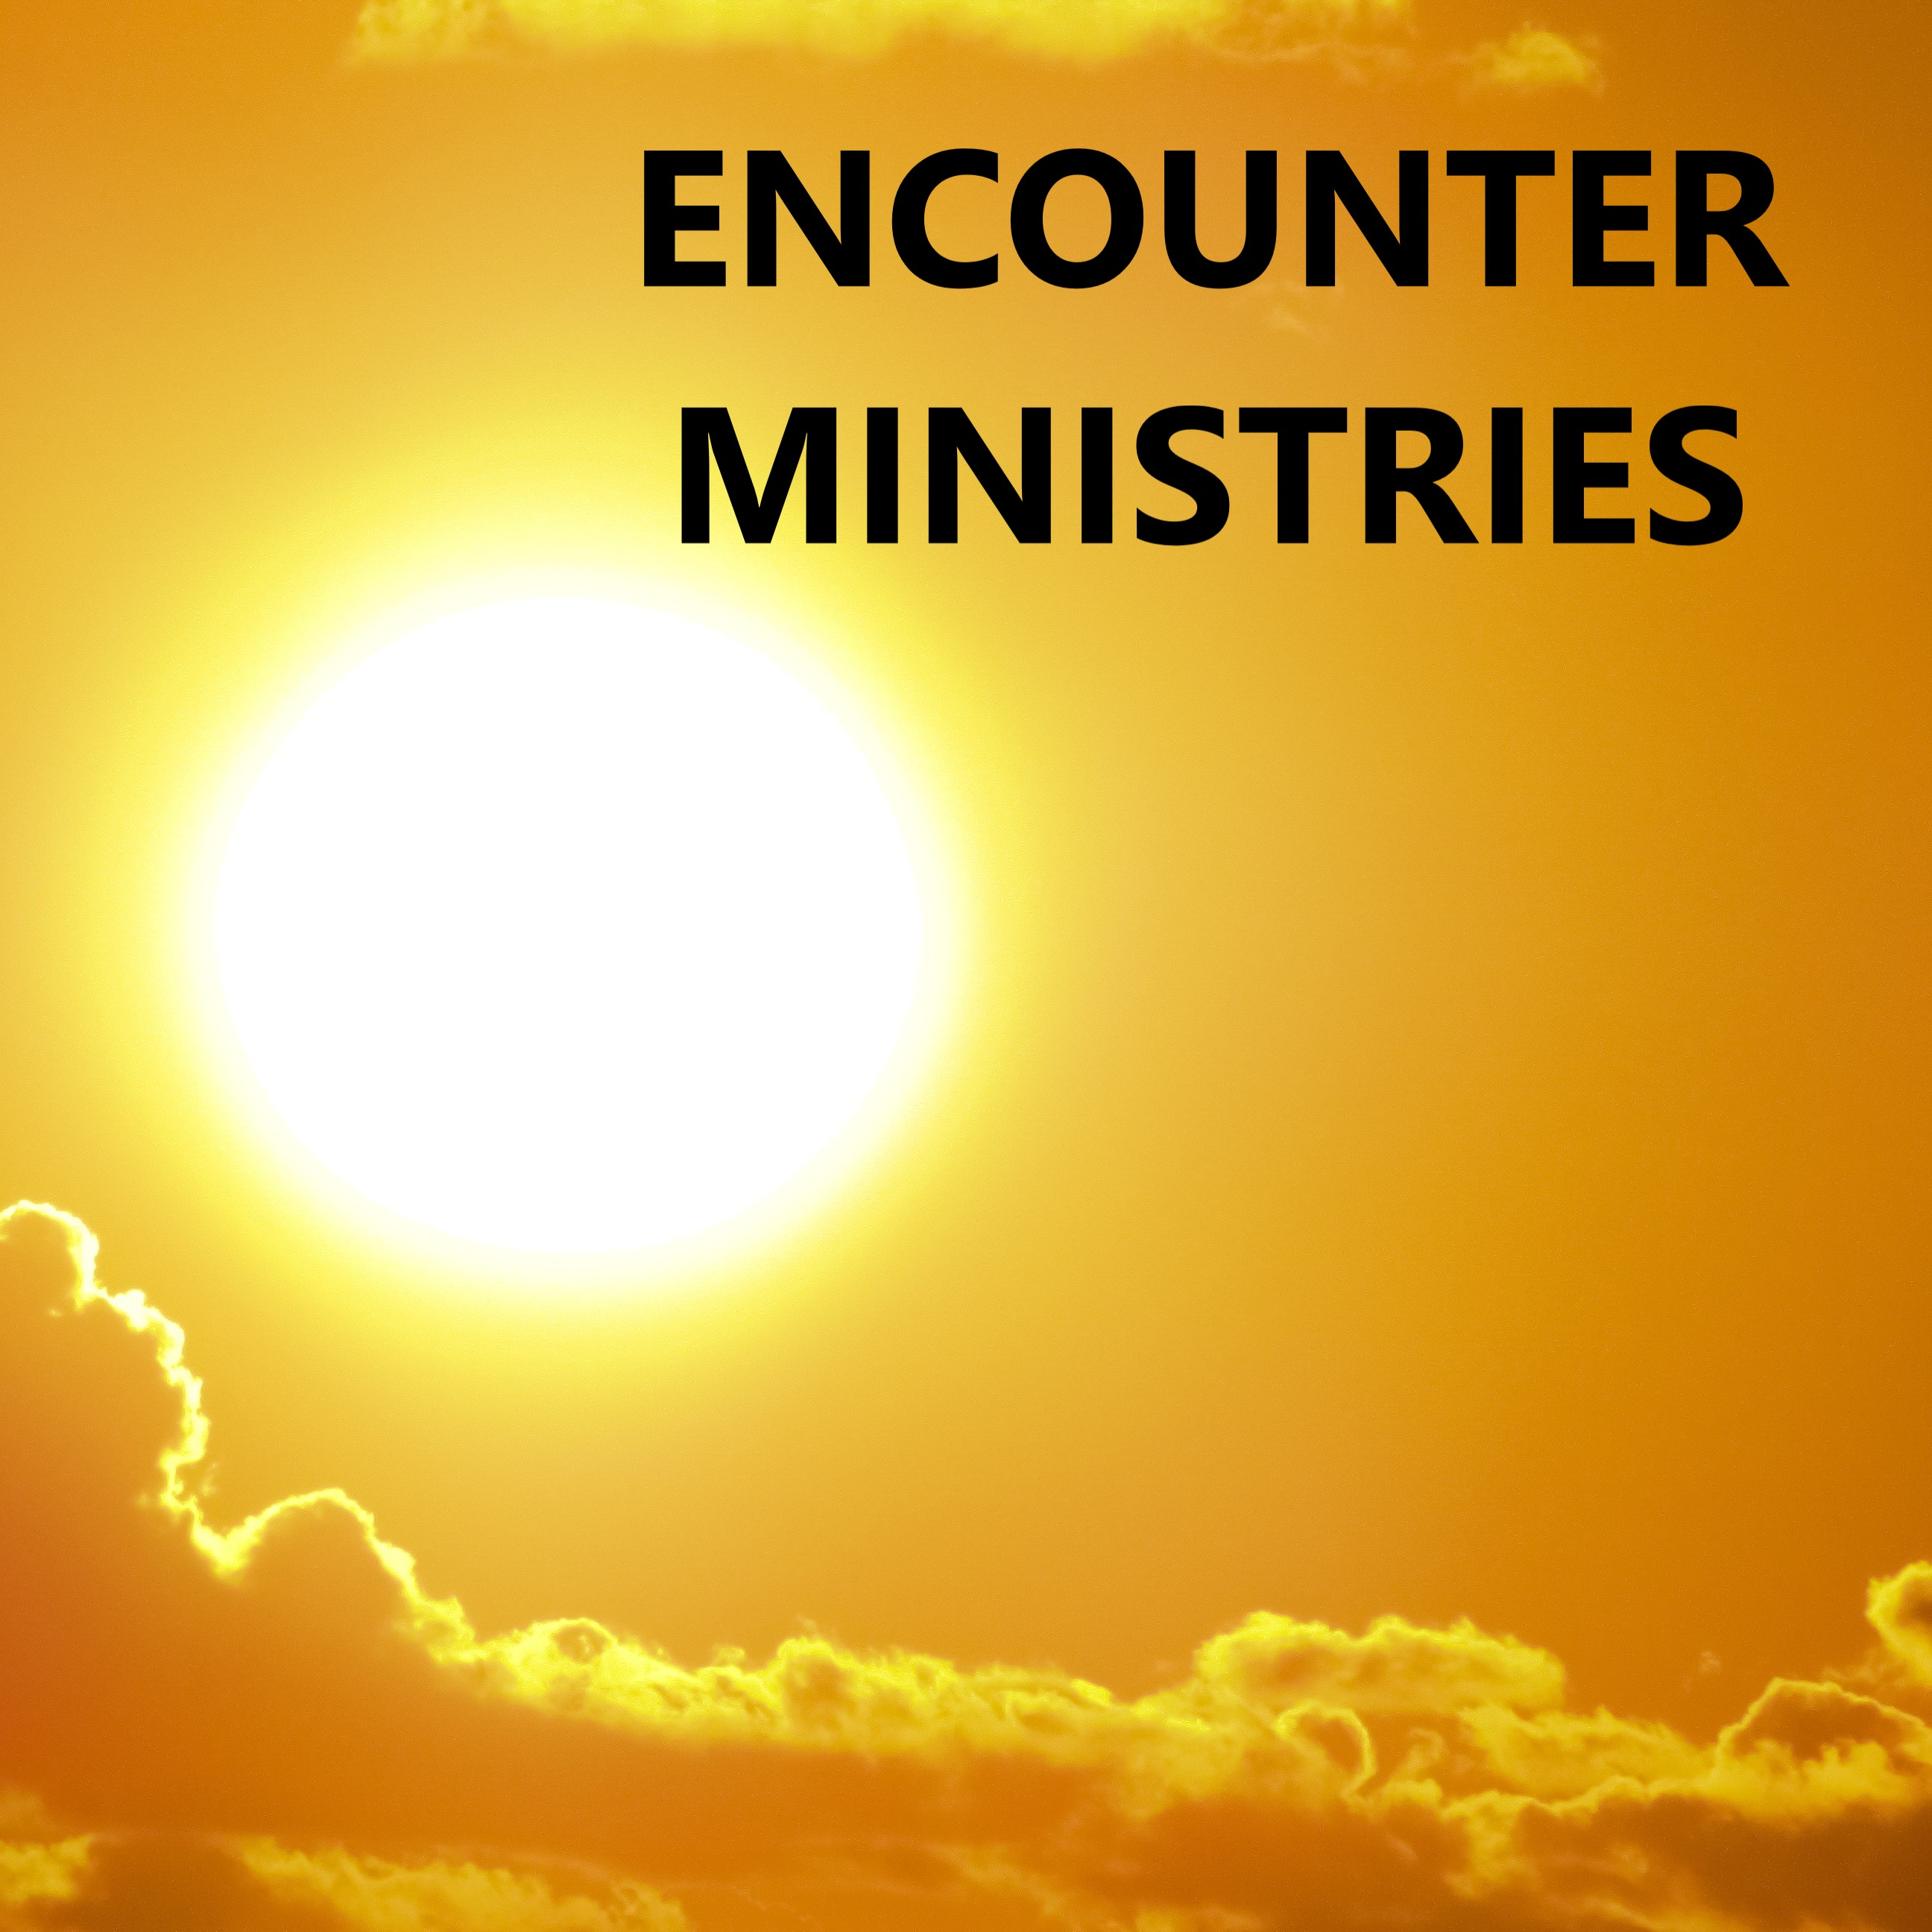 Encounter Ministries